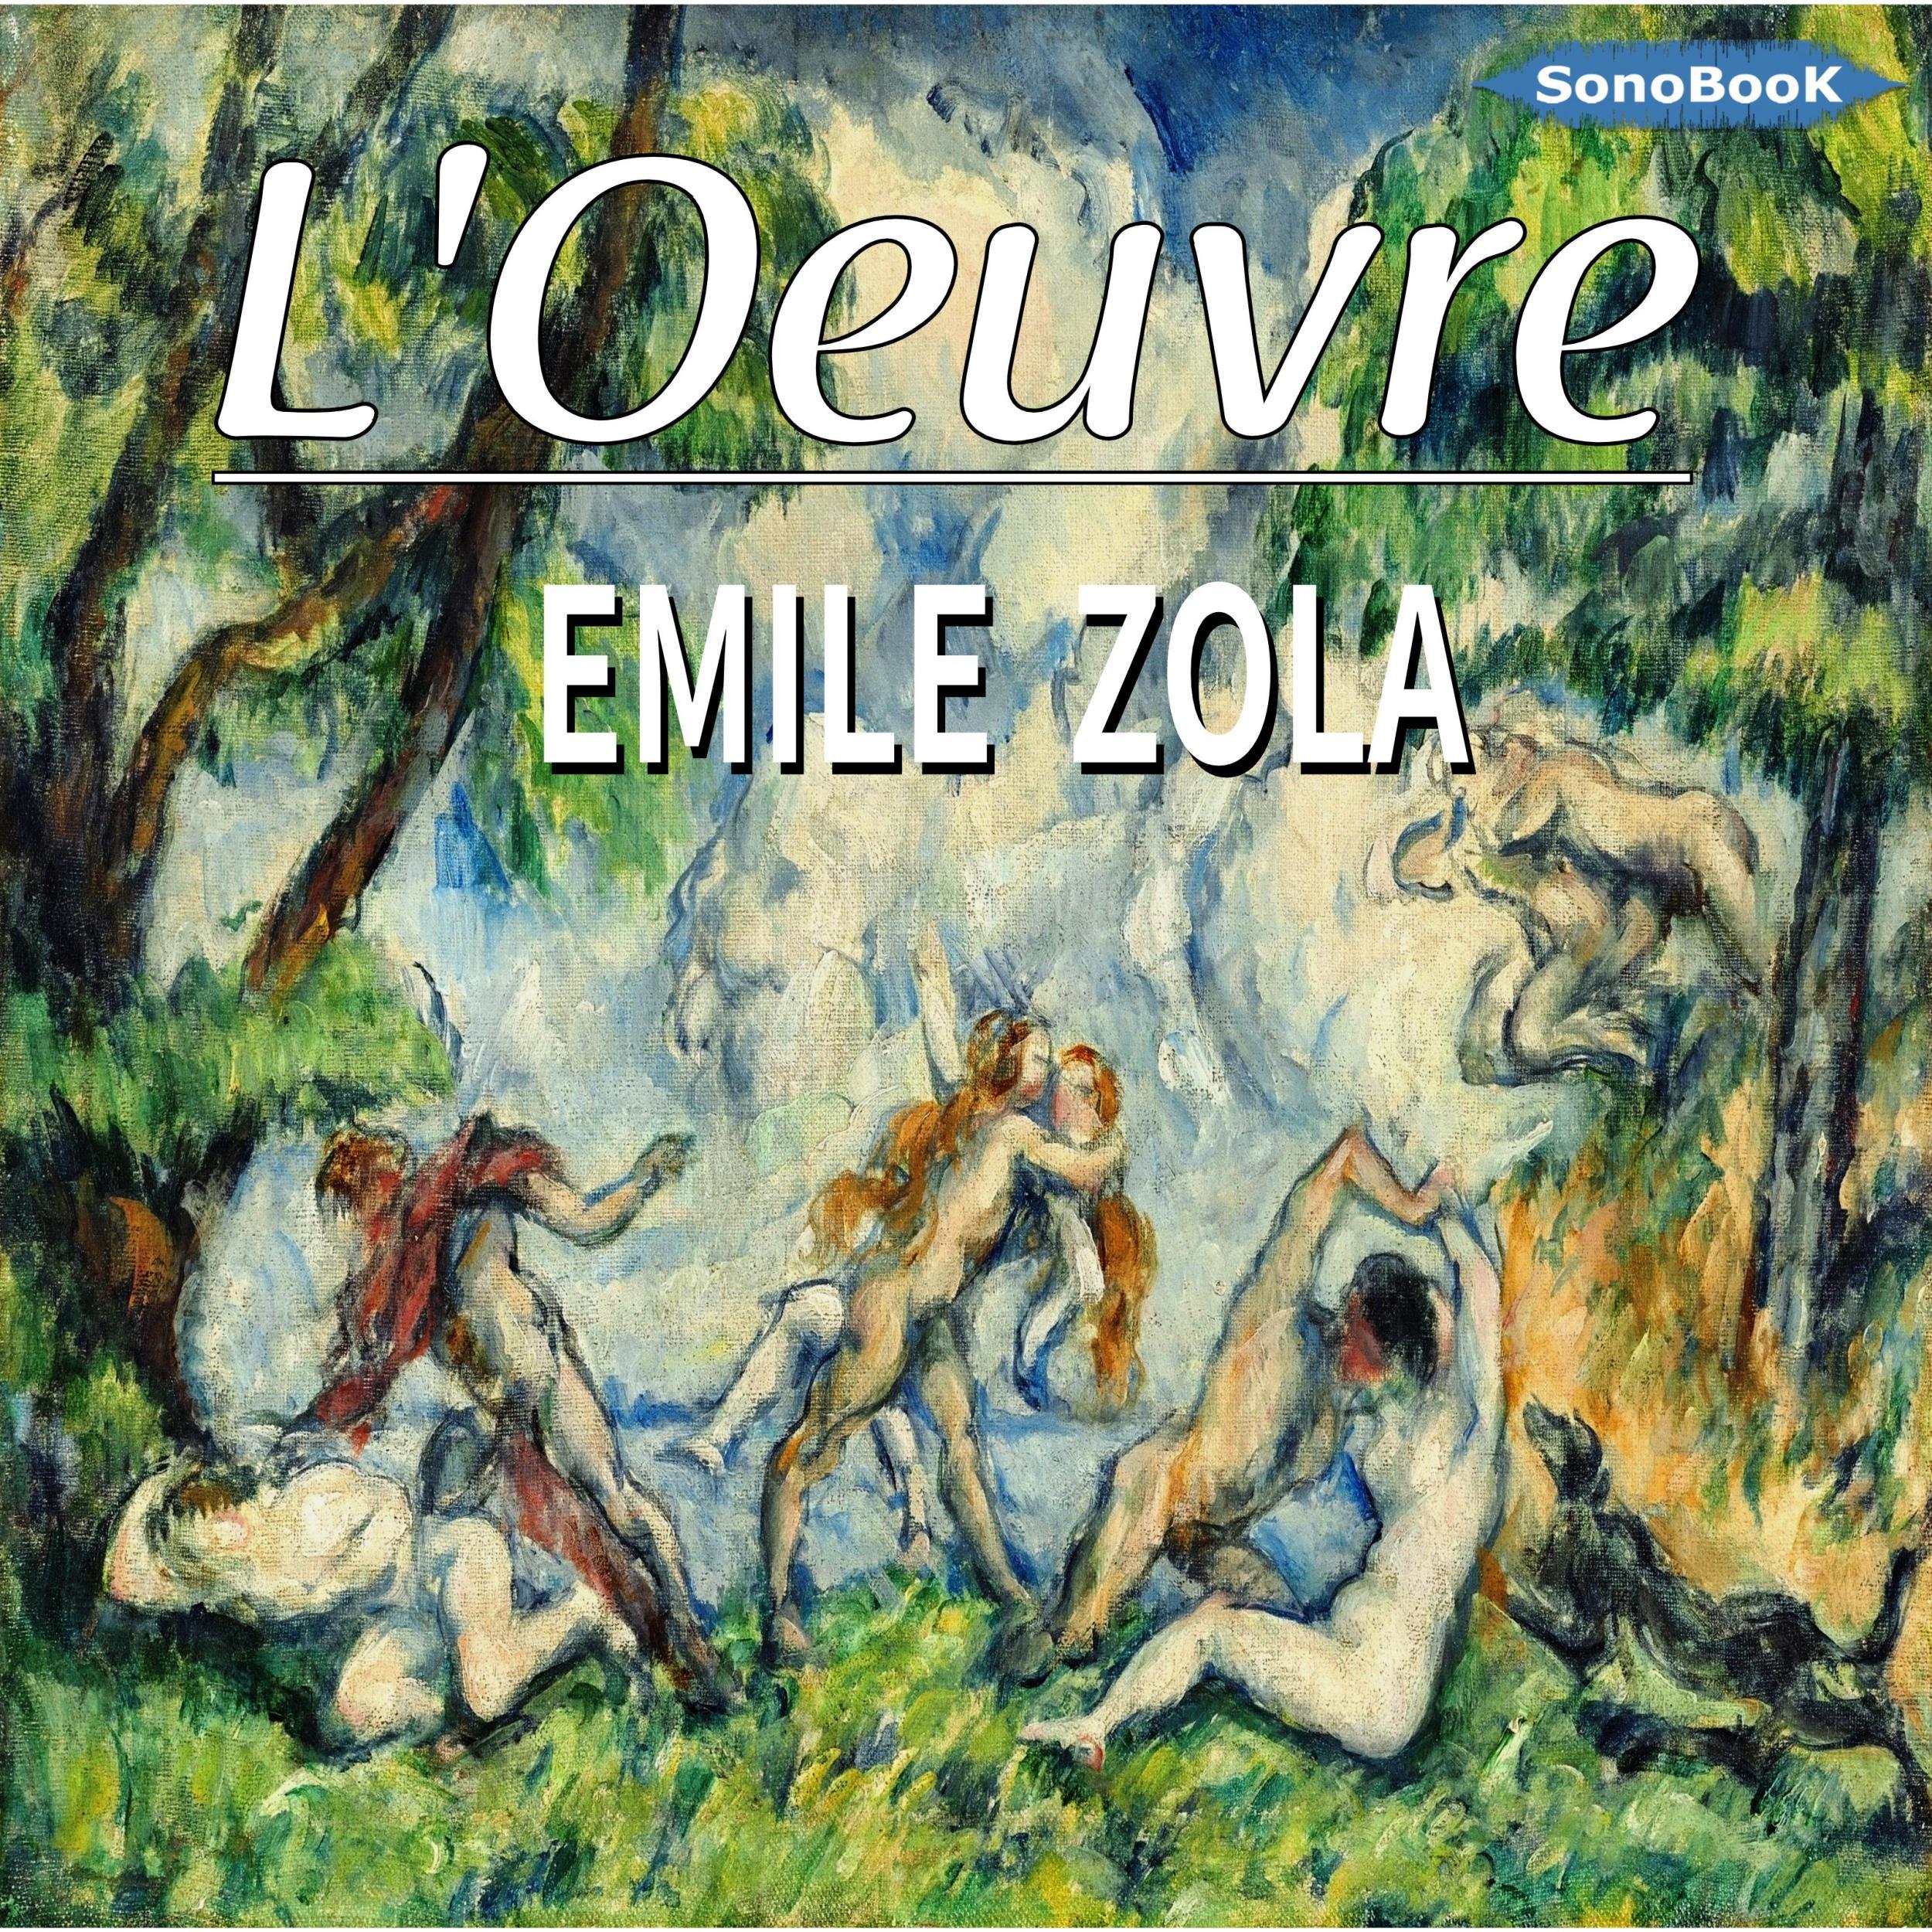 L Oeuvre De Emile Zola Livre Audio Livres Audio Sonobook